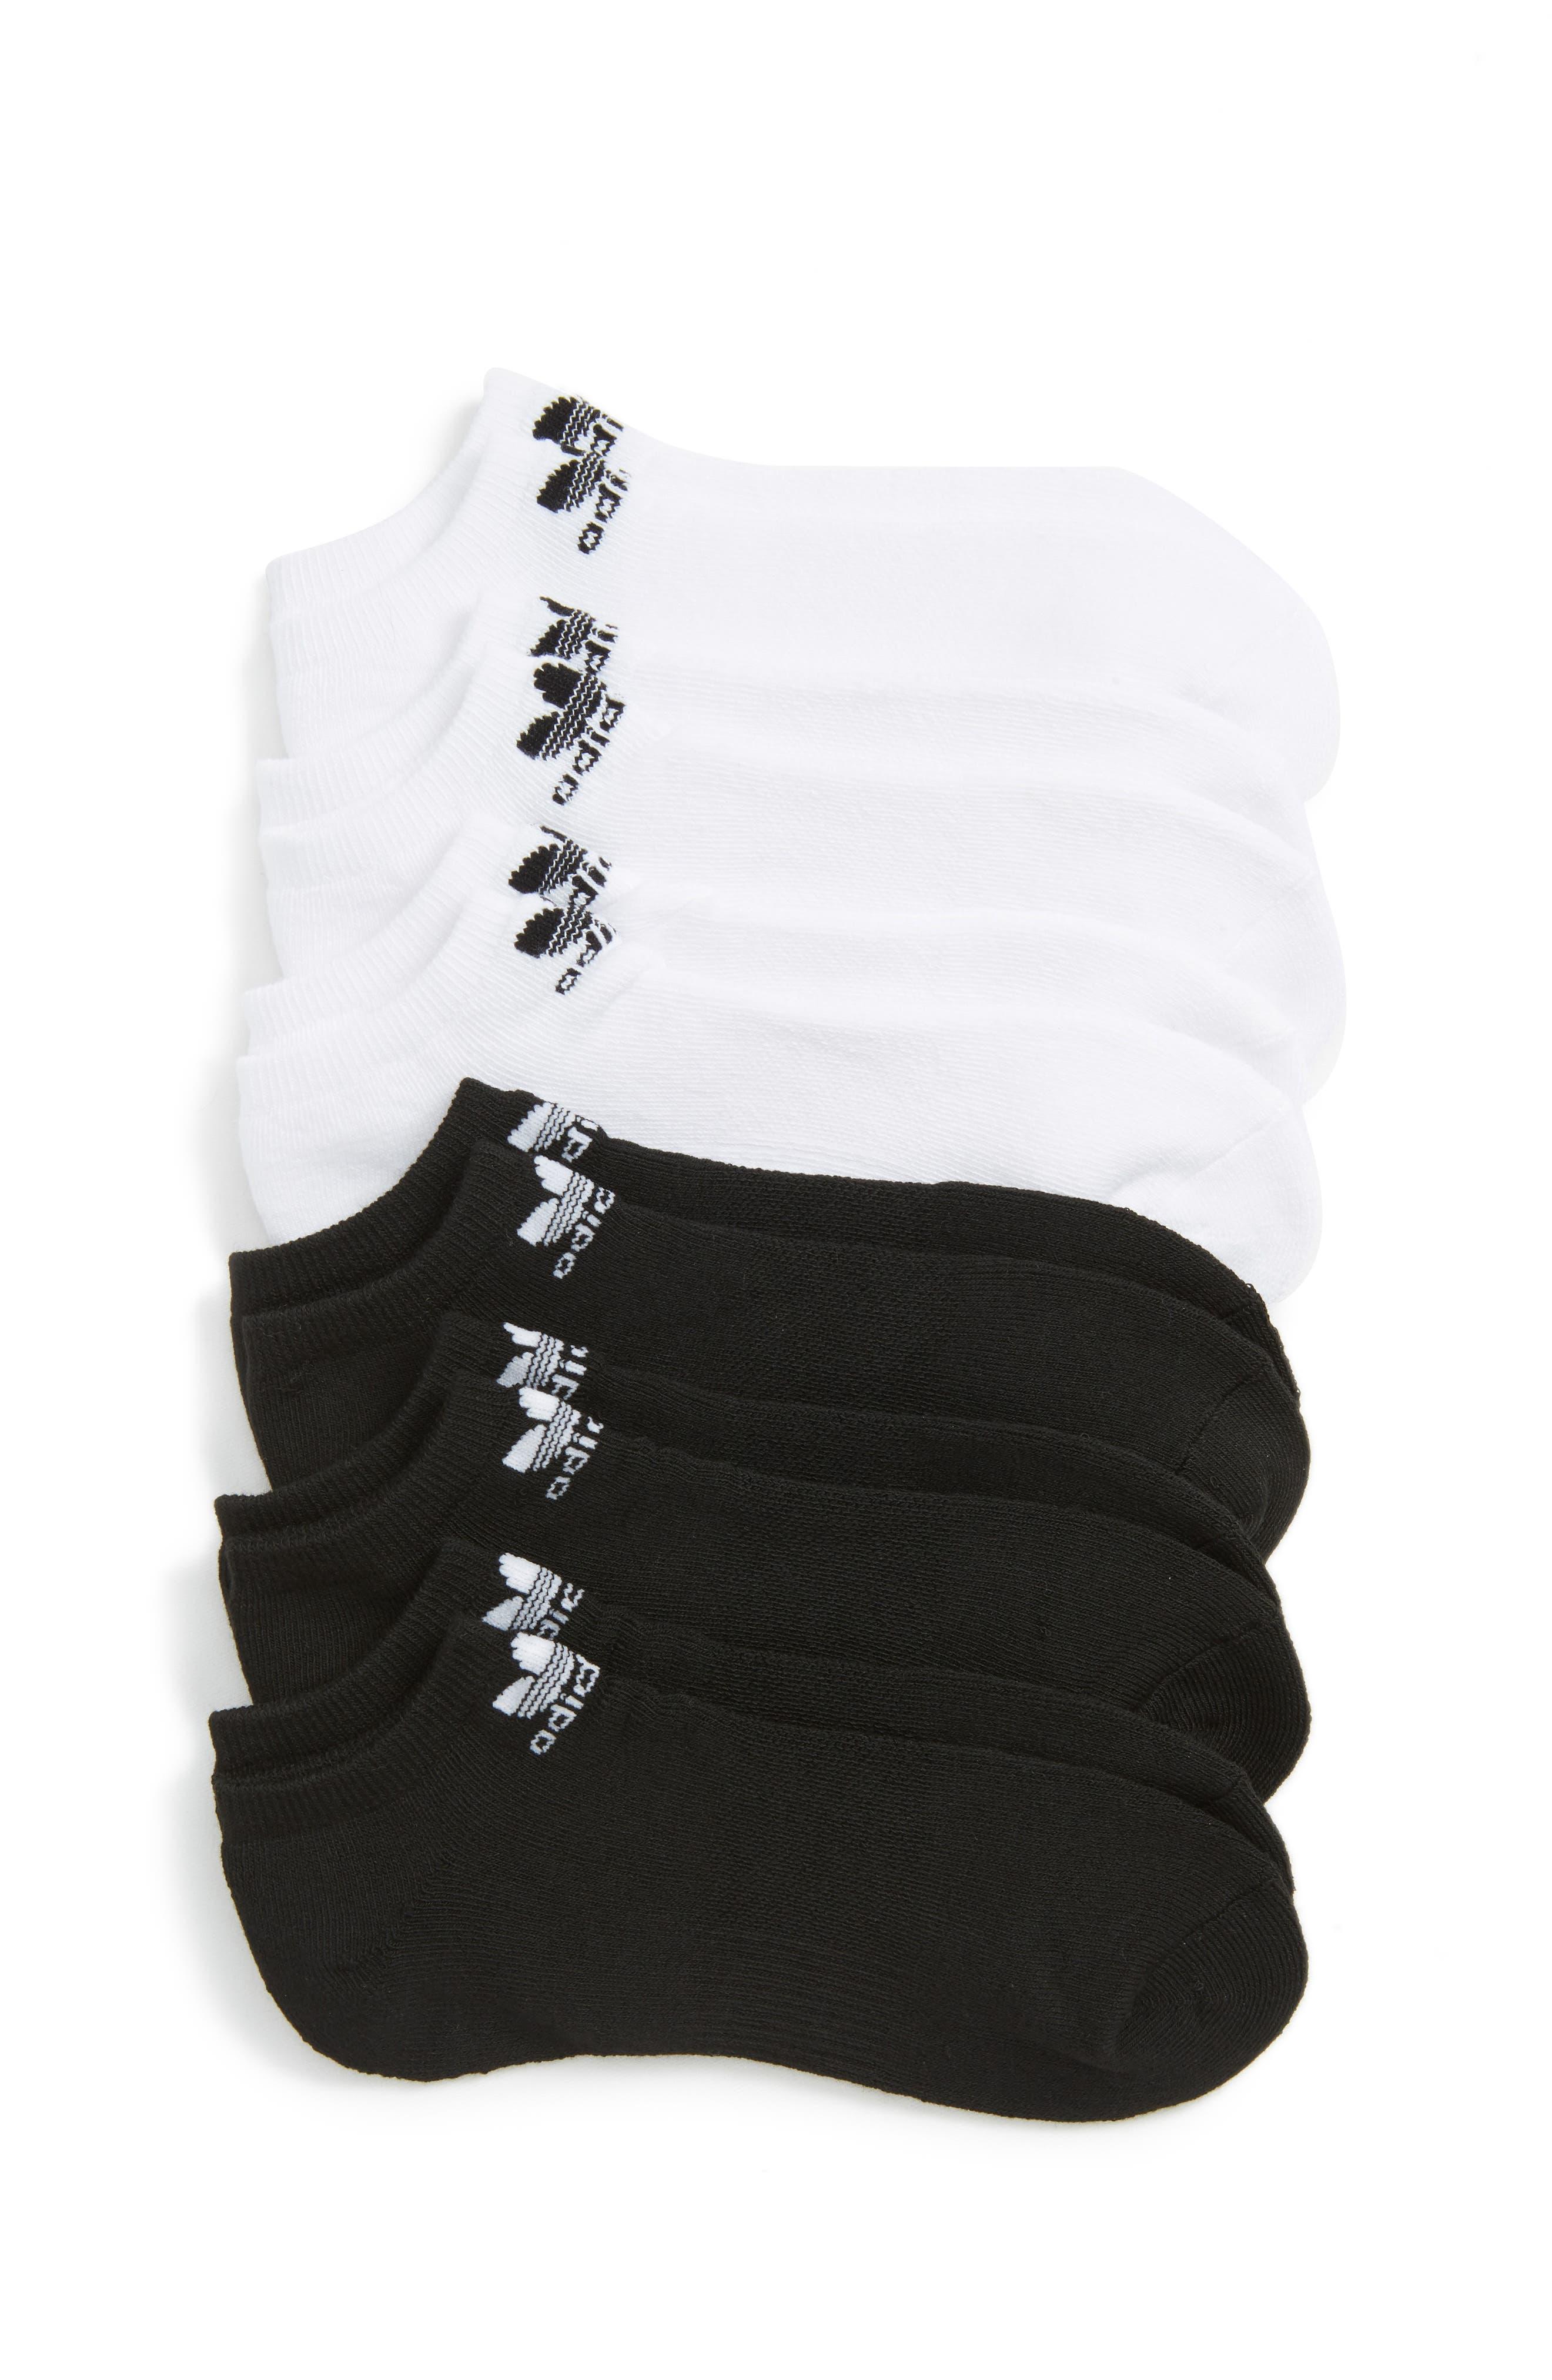 Trefoil 6-Pack No-Show Socks,                             Main thumbnail 1, color,                             BLACK/ WHITE